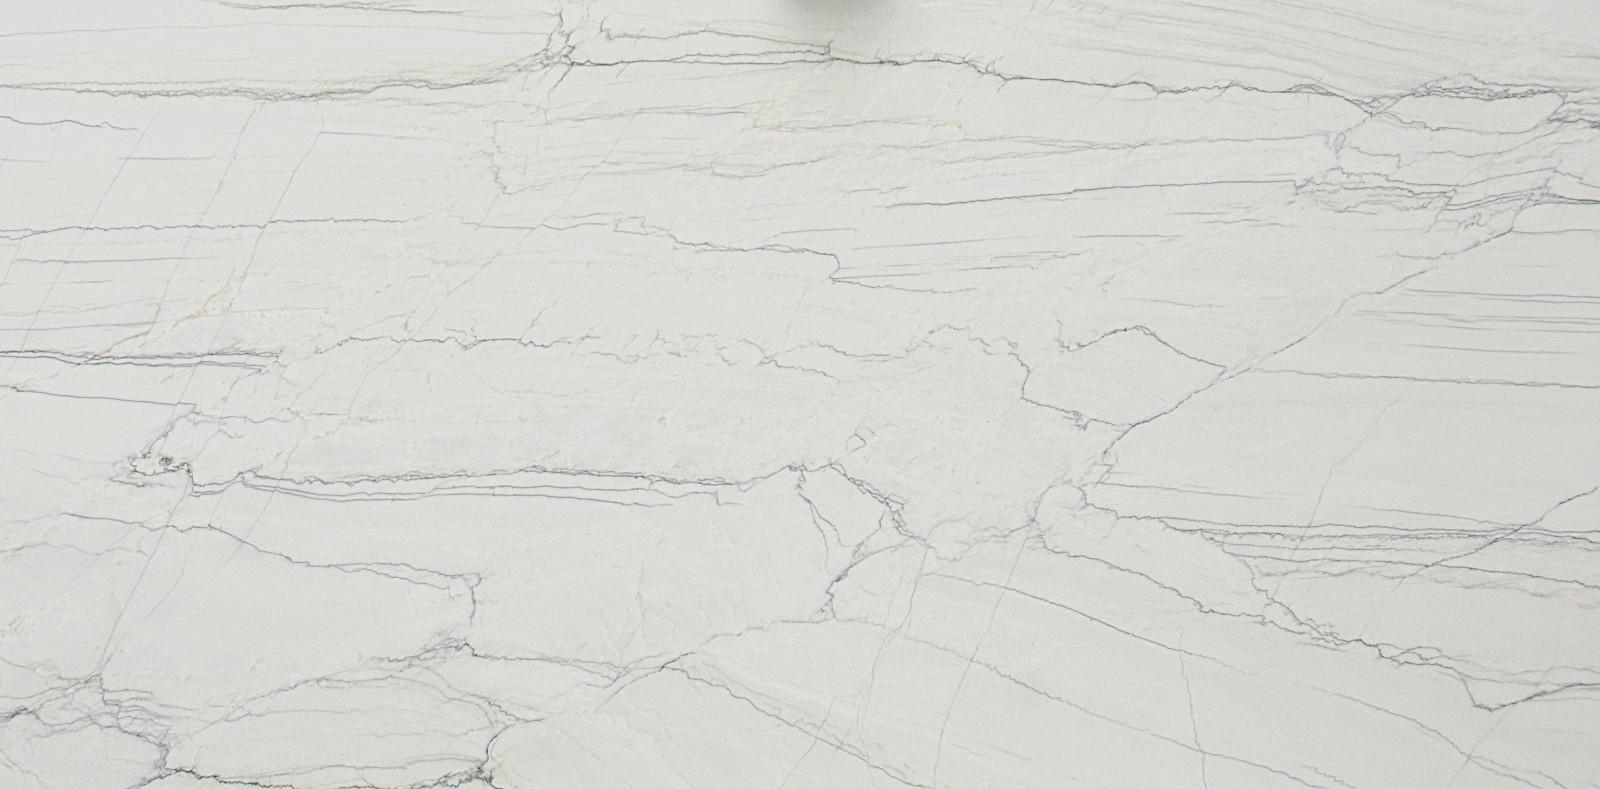 Kwarc Naturalny White Macaubas-kopia.JPG